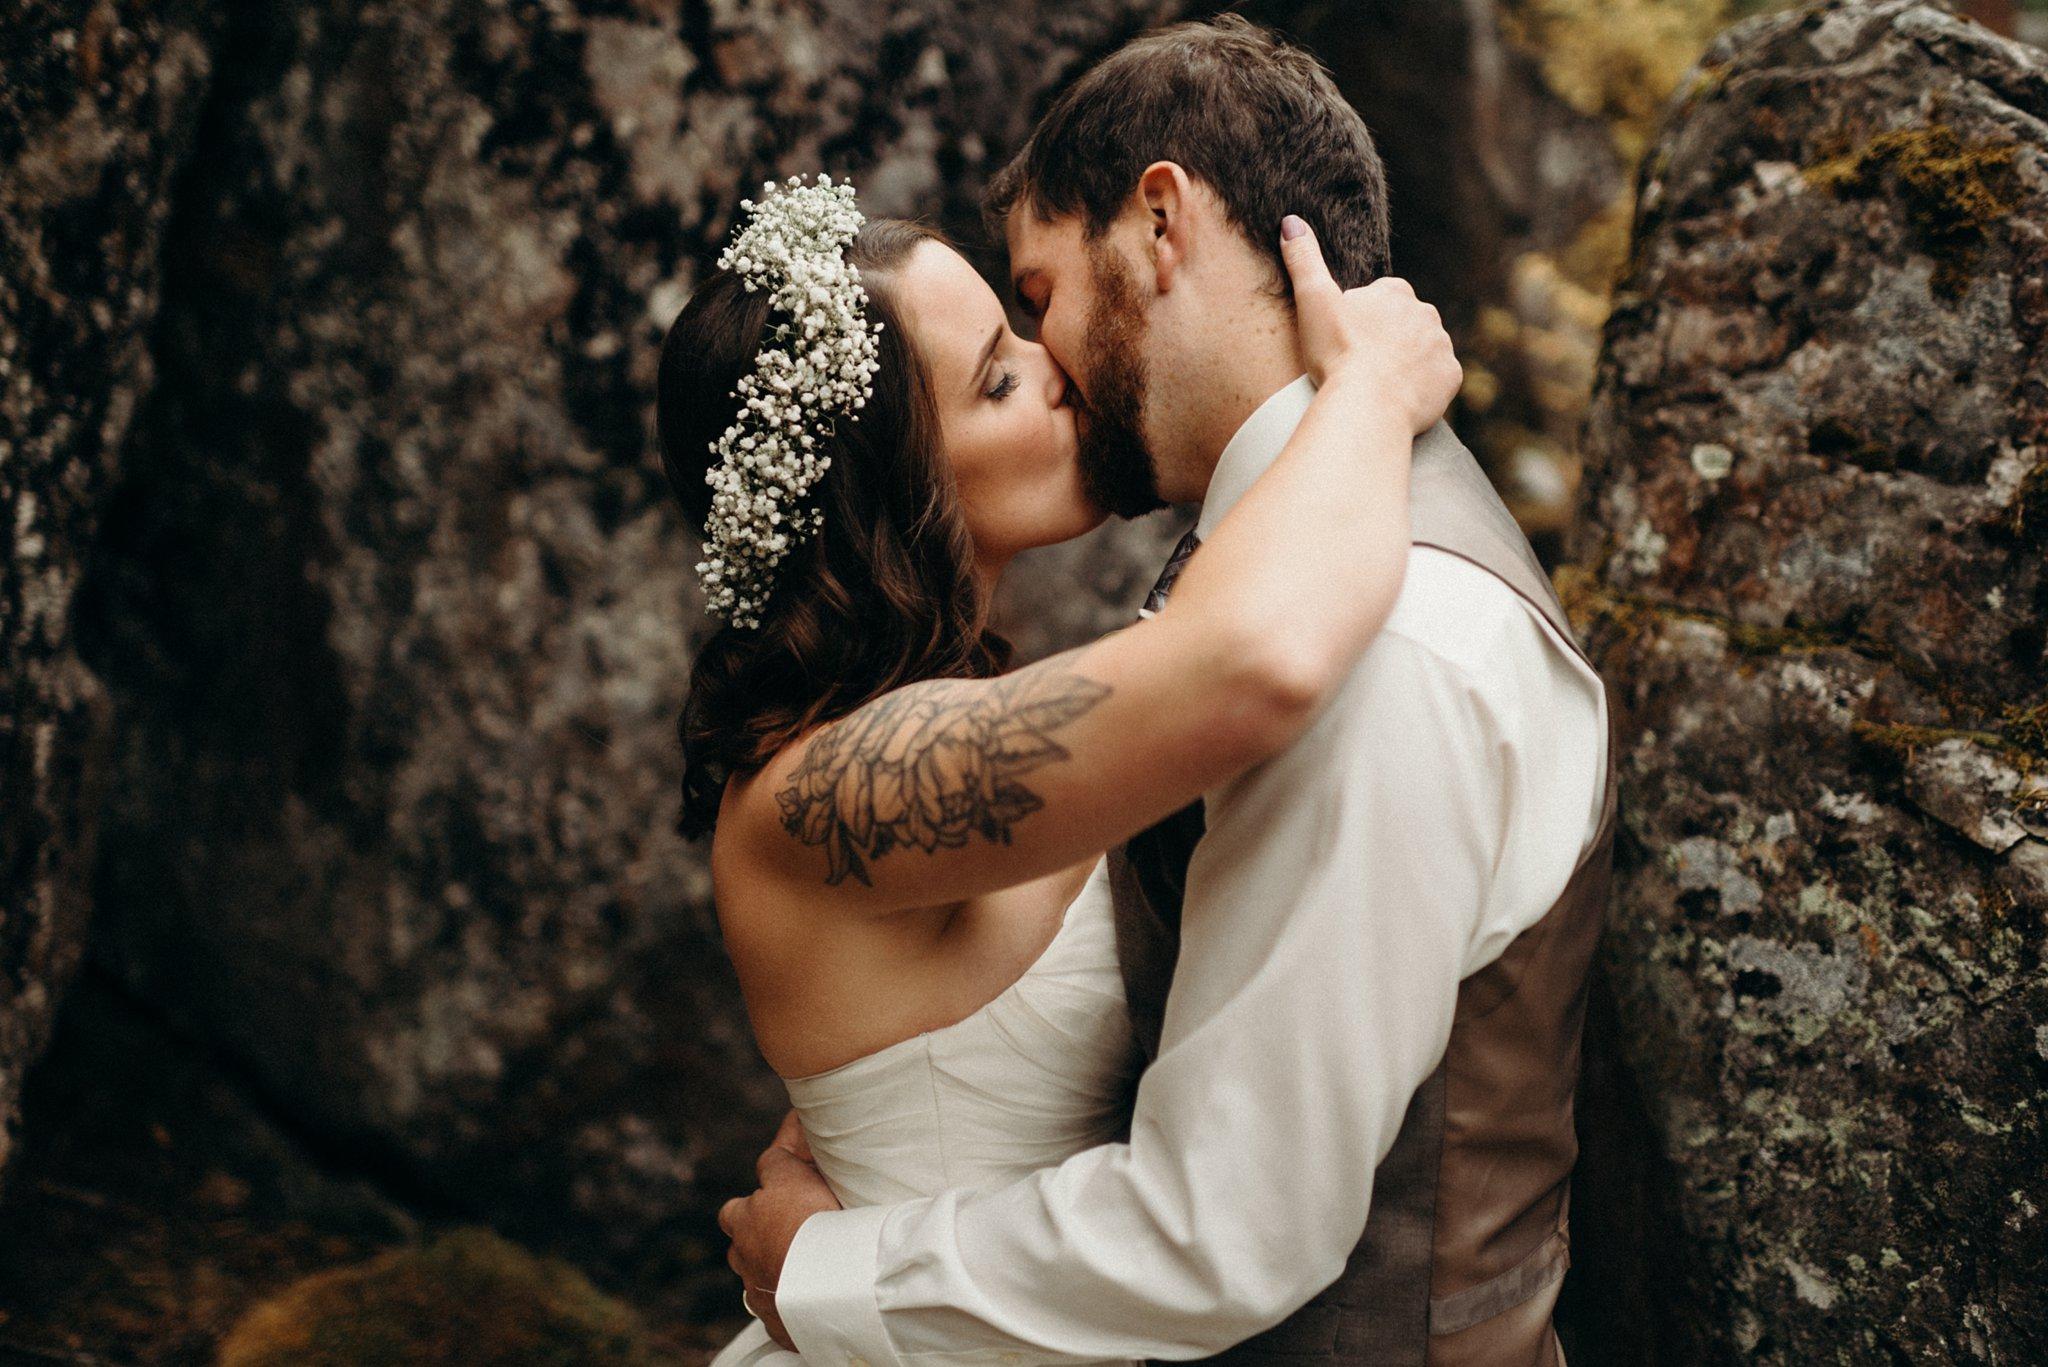 kaihla_tonai_intimate_wedding_elopement_photographer_6905.jpg